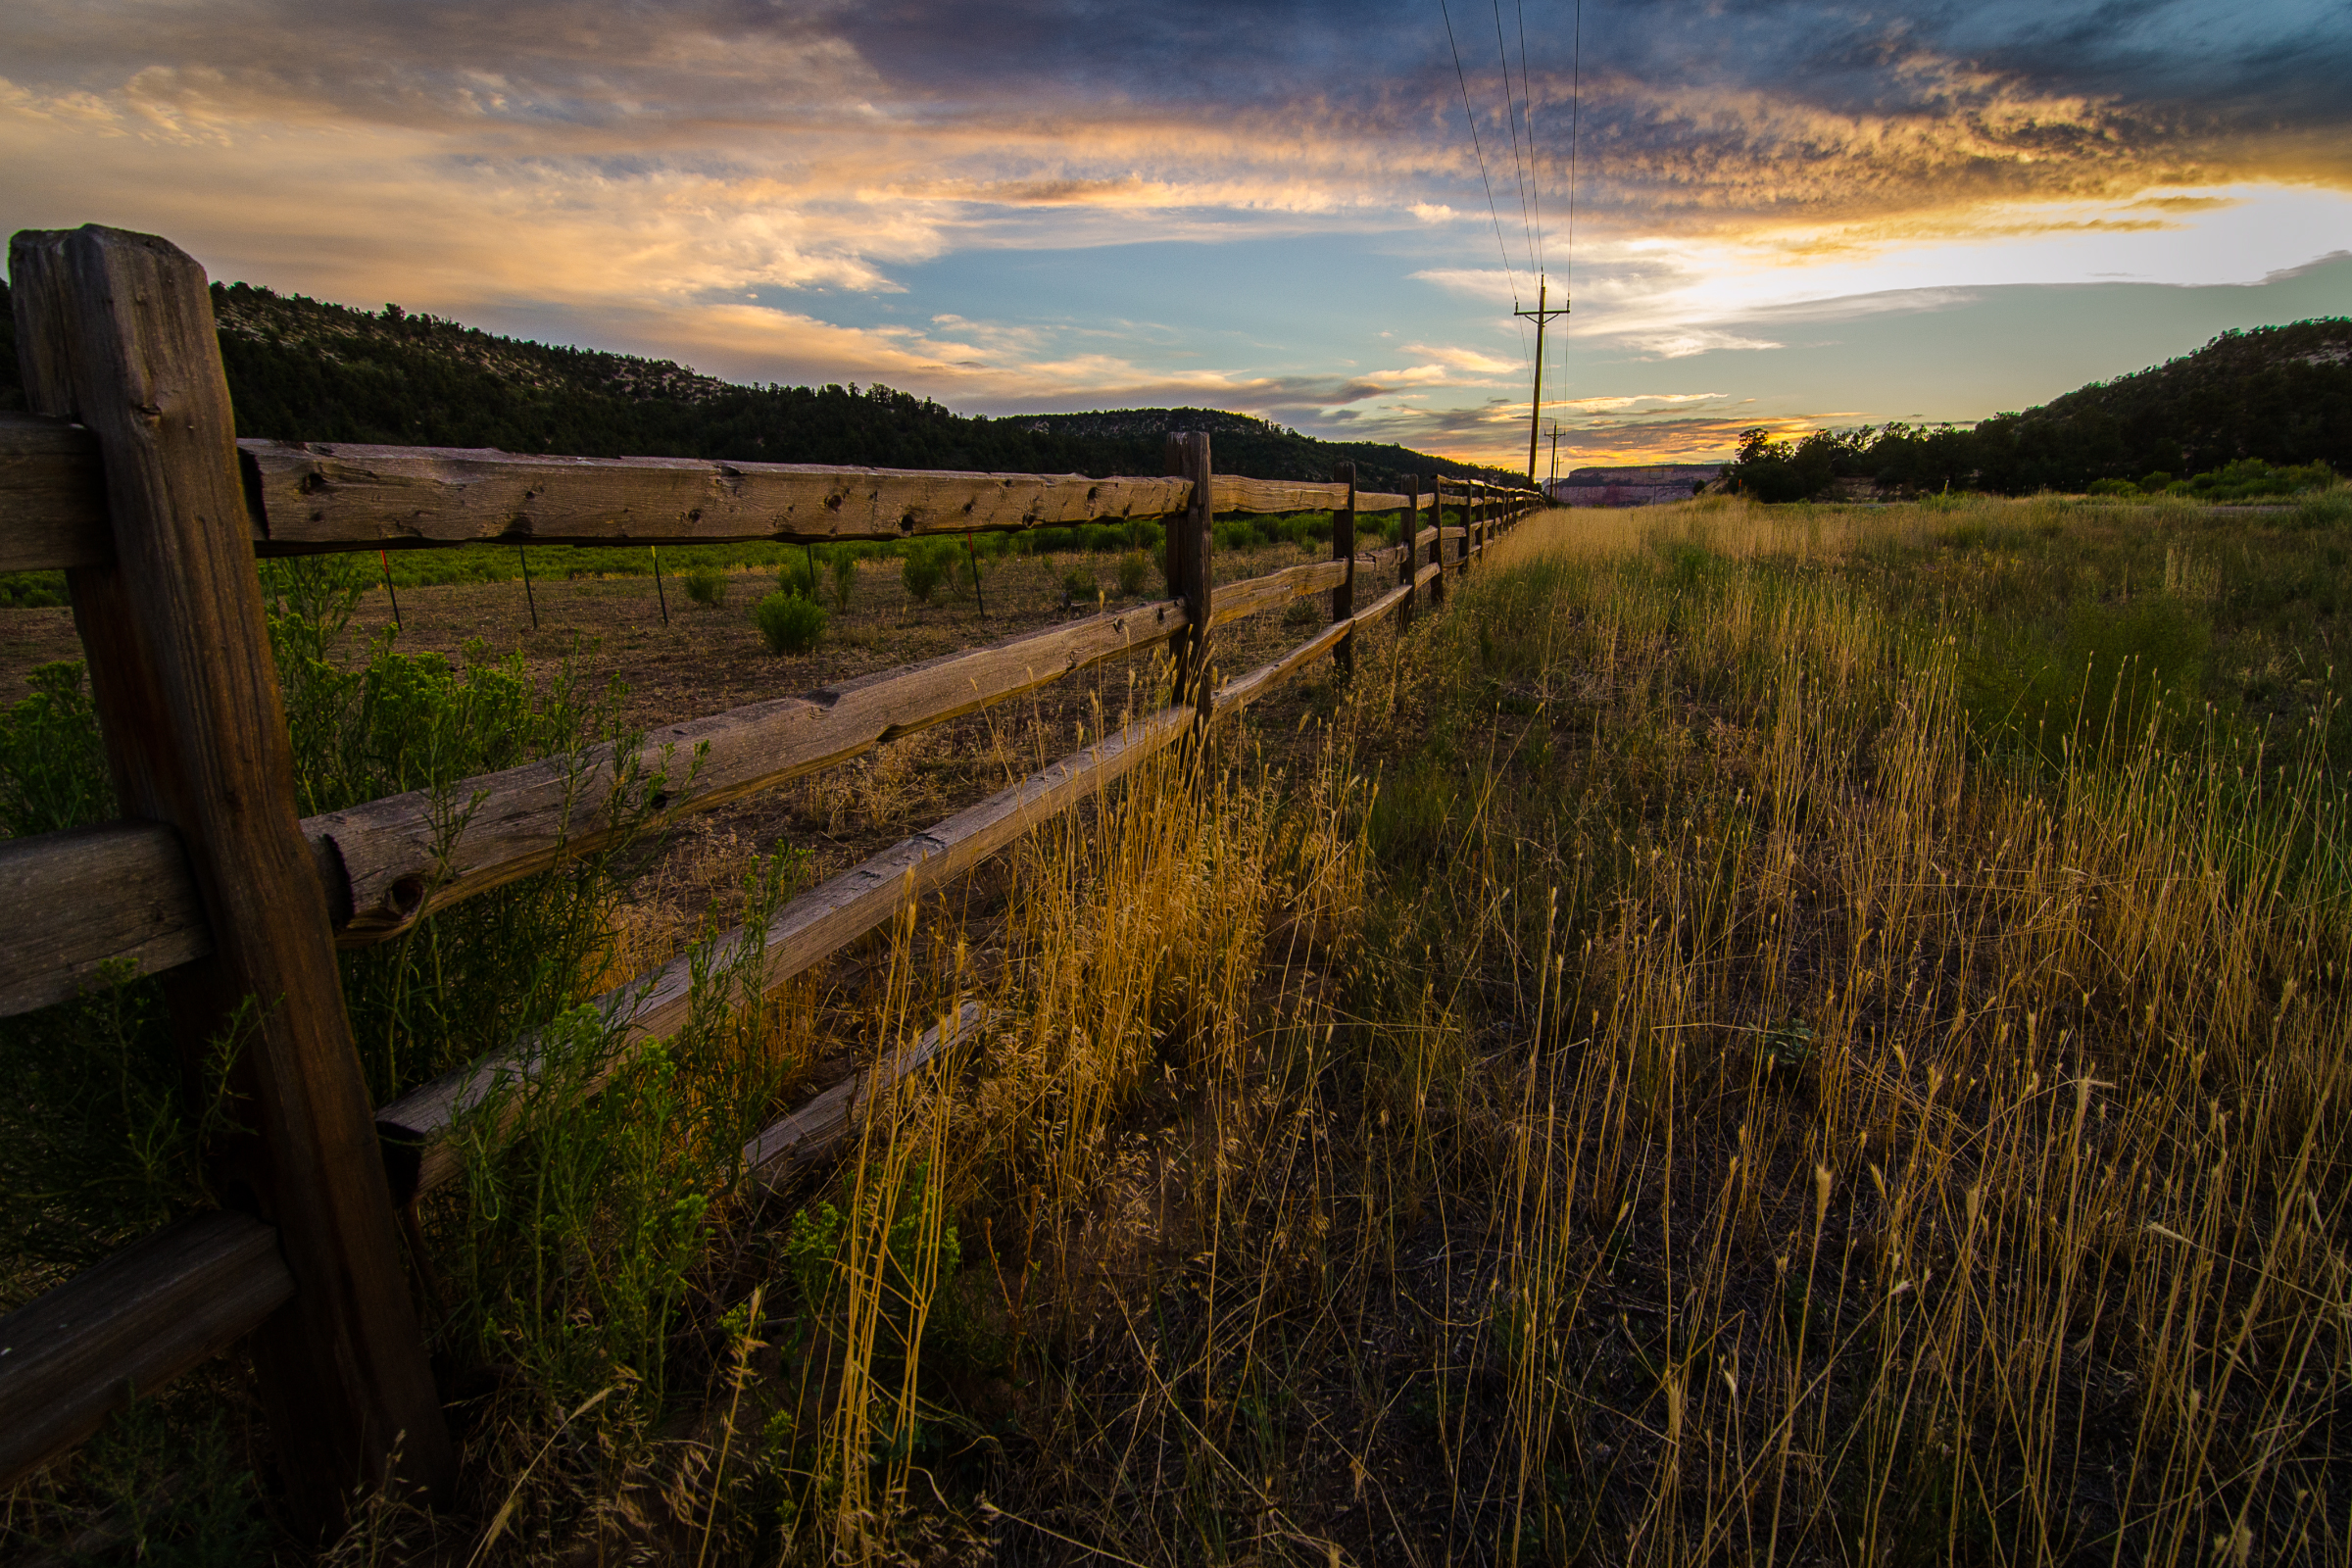 Leaving Zion National Park, Utah. Wasim Muklashy Photography